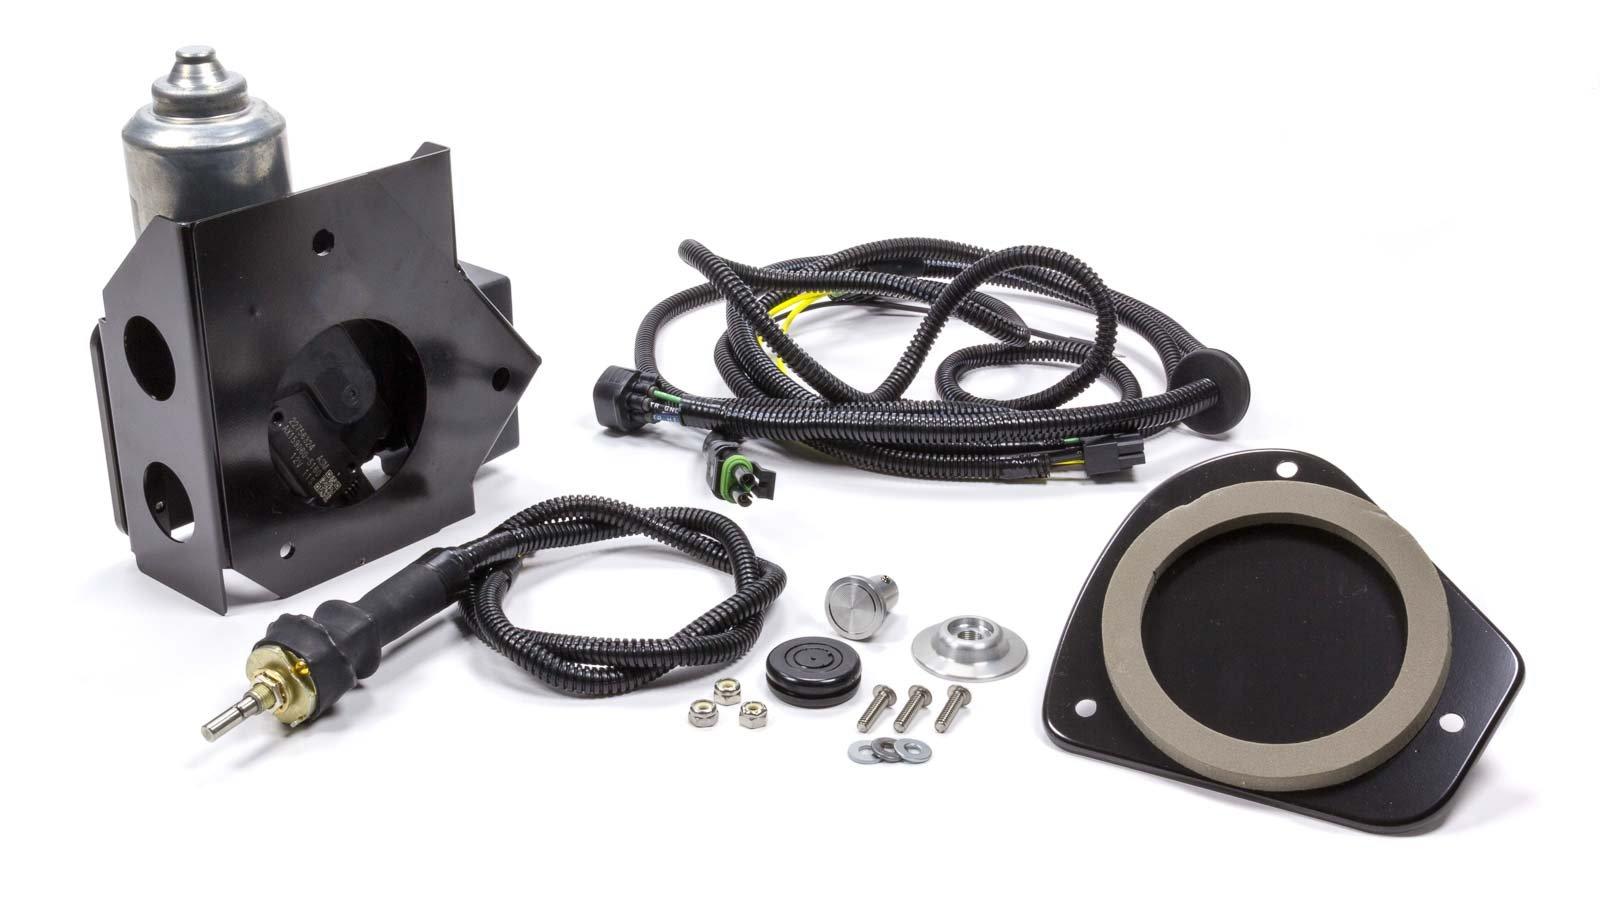 Detroit Speed 121616 Selecta-Speed Wiper Kit